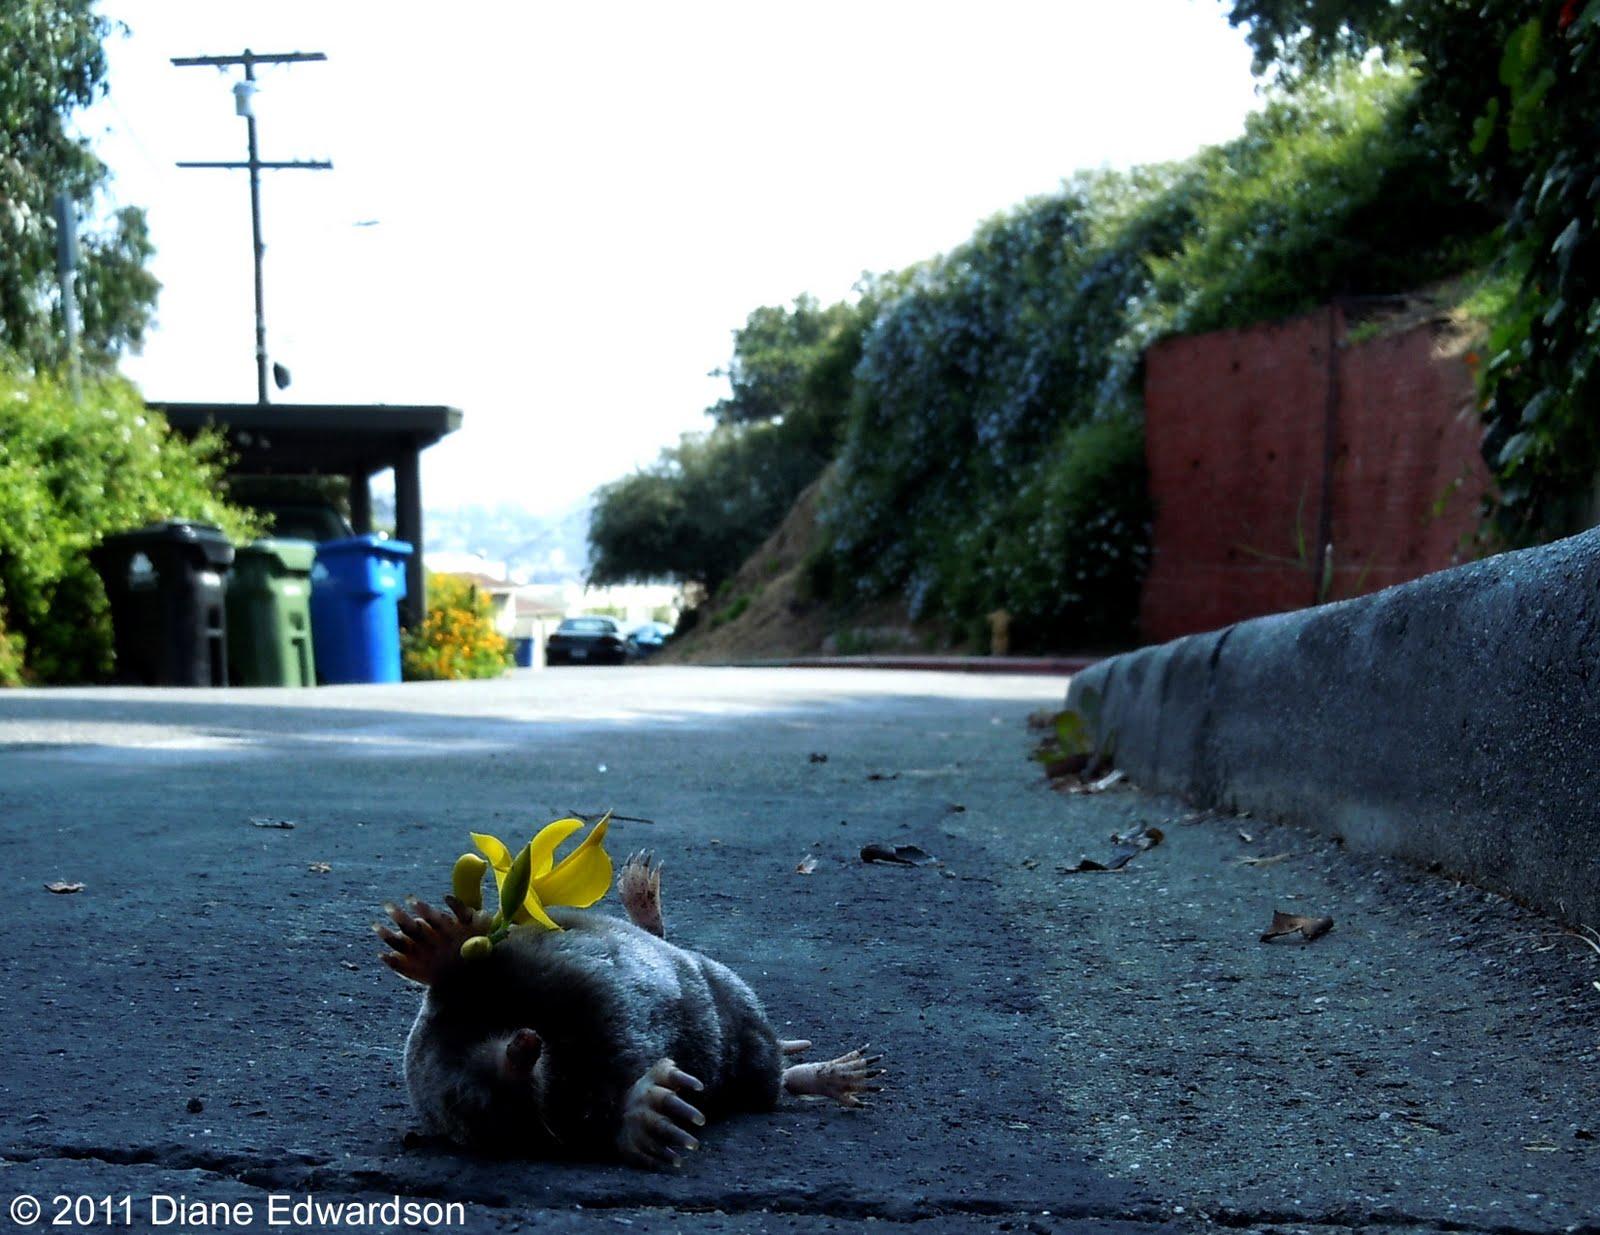 mole vs gopher hill